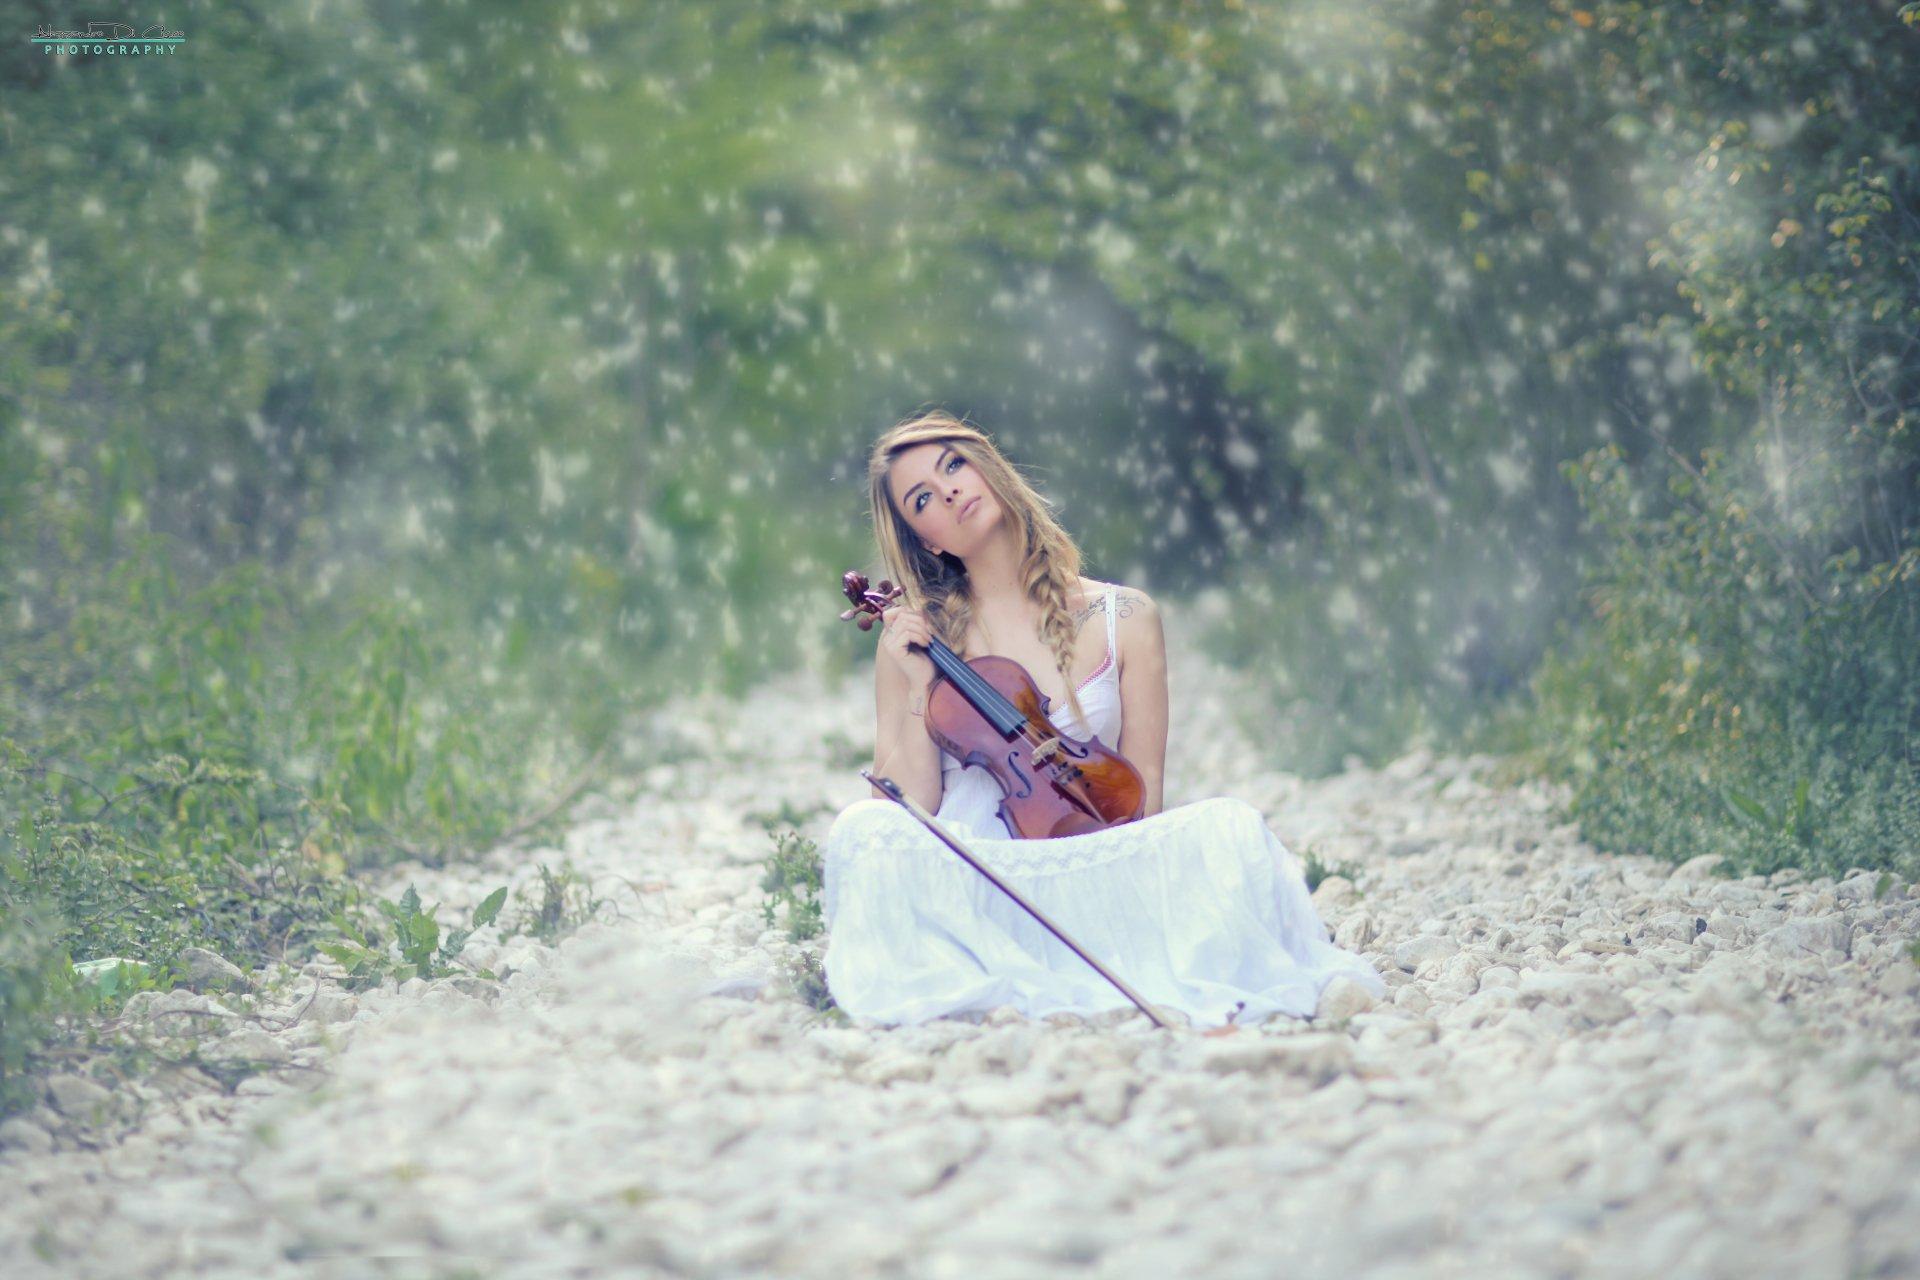 Women - Mood  Snowfall Violin Woman Tattoo Girl Wallpaper